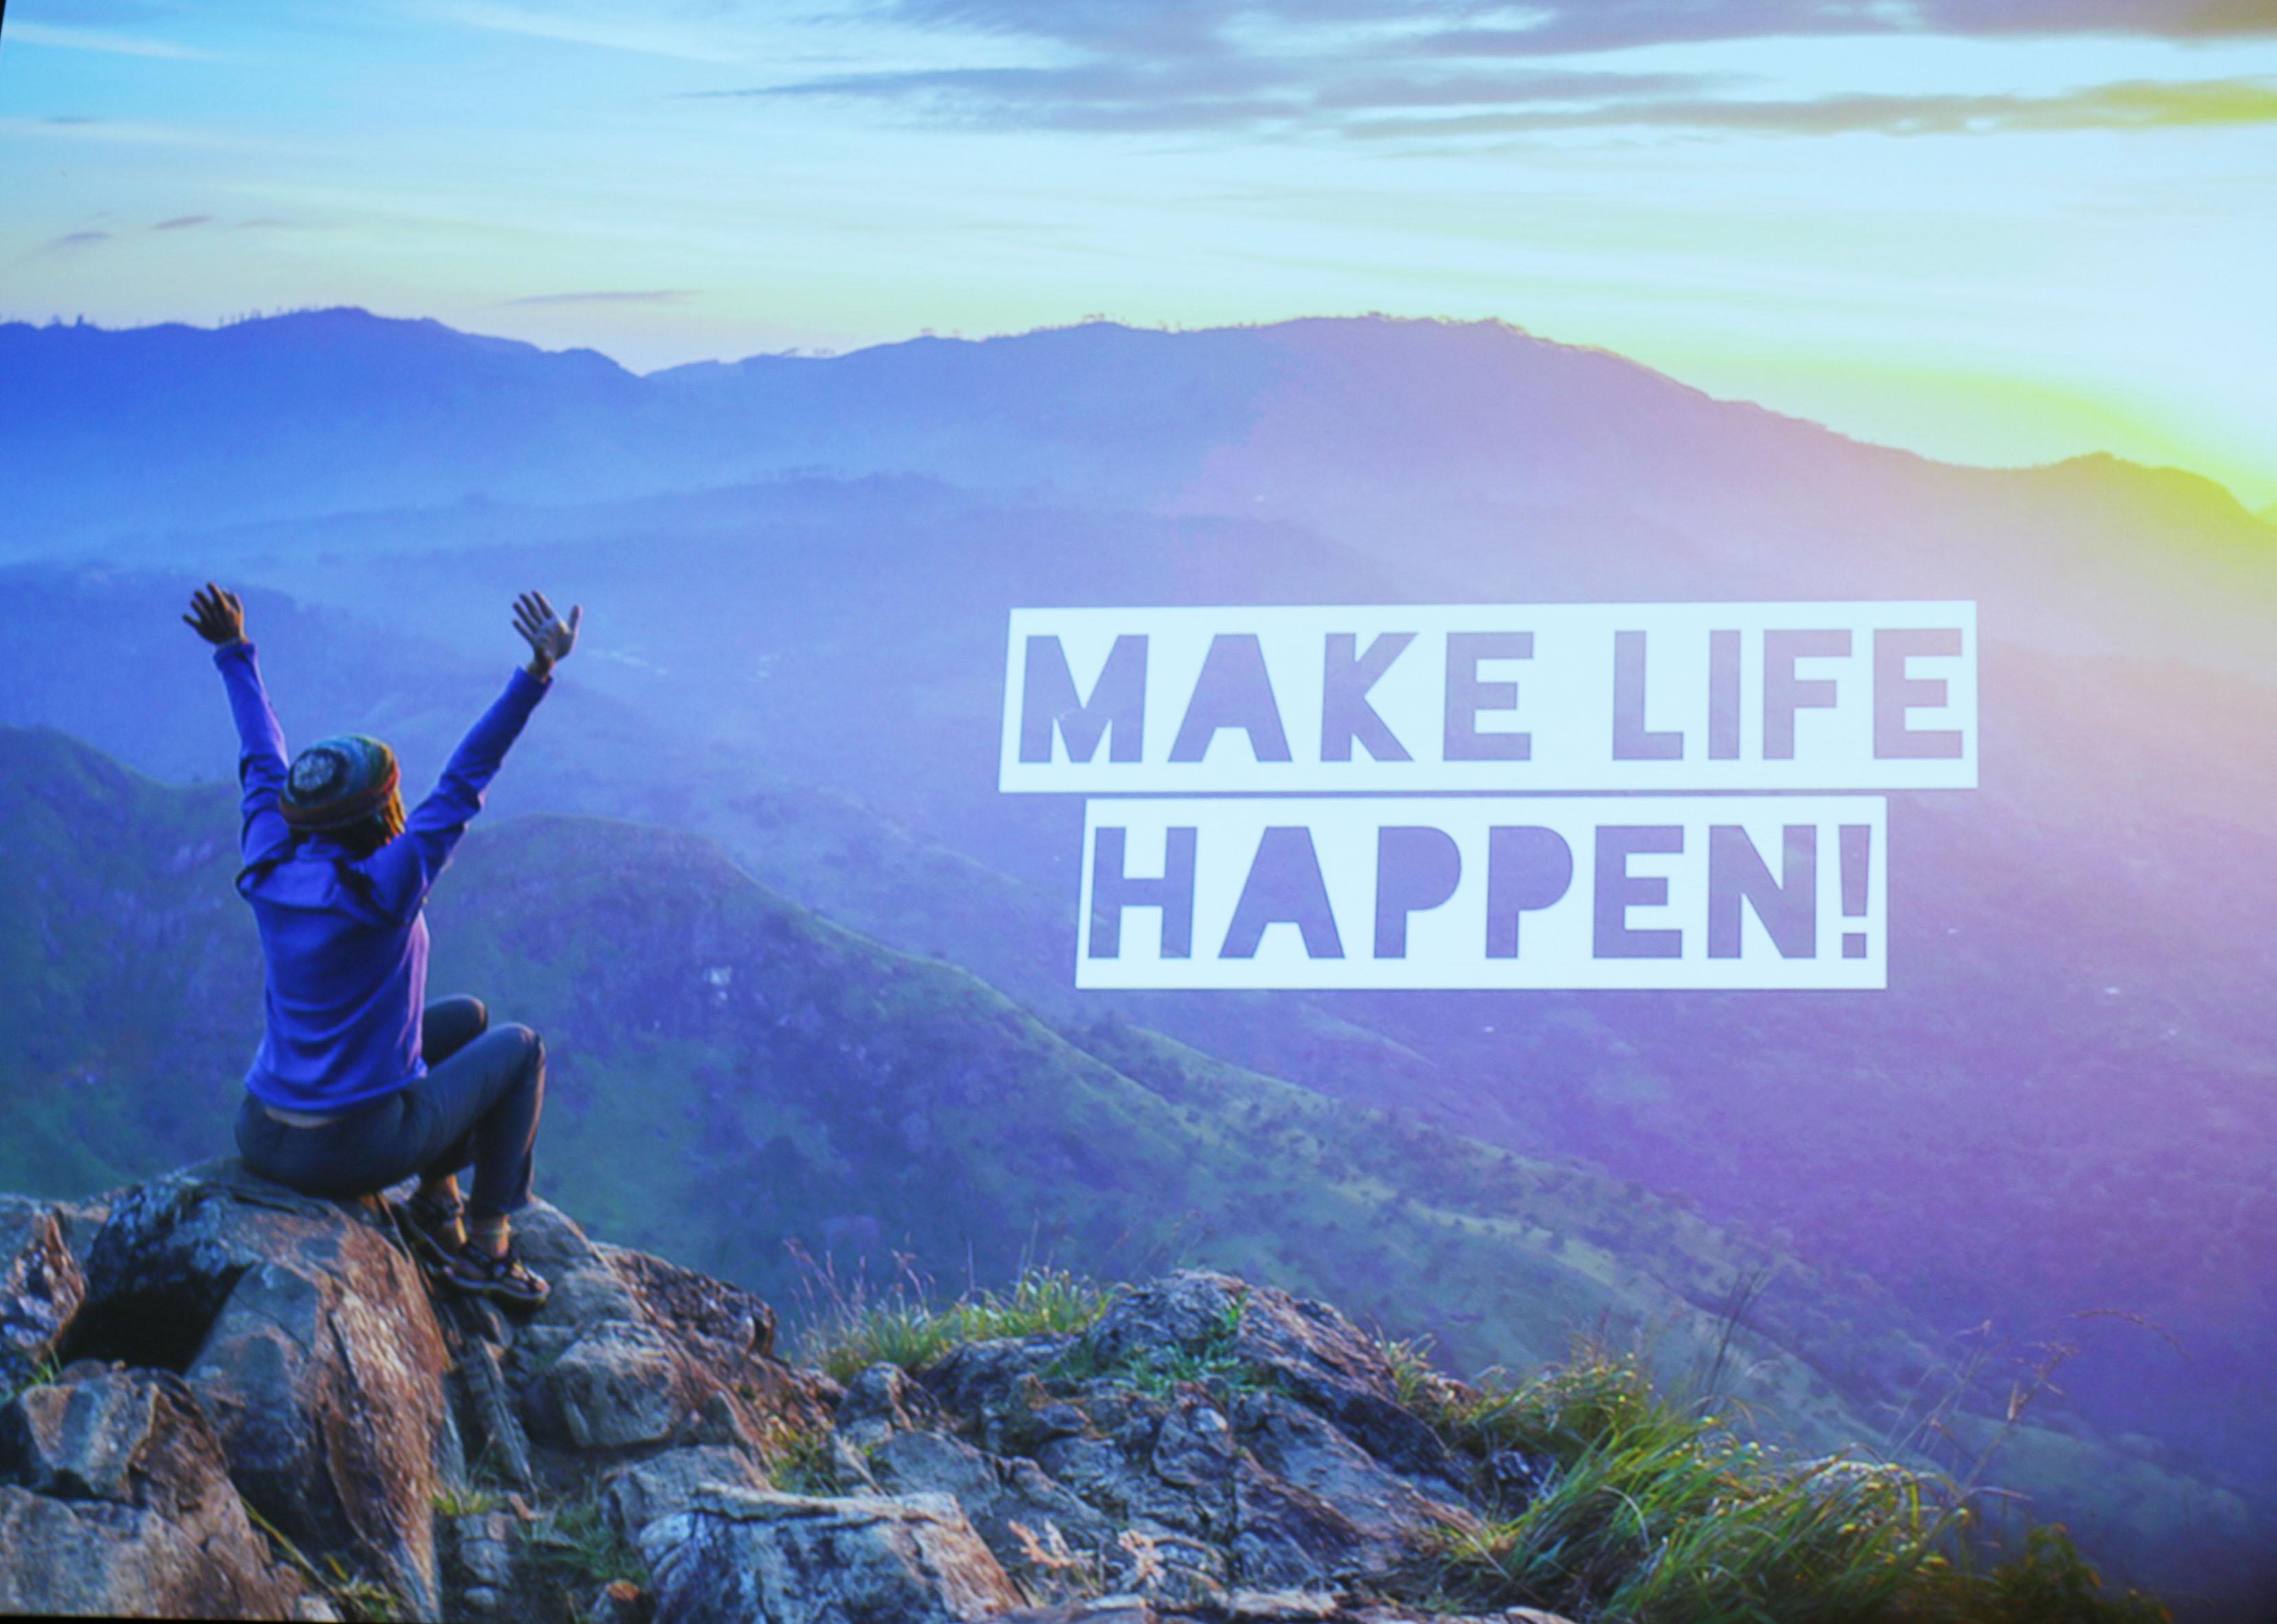 img_6672-make-life-happen